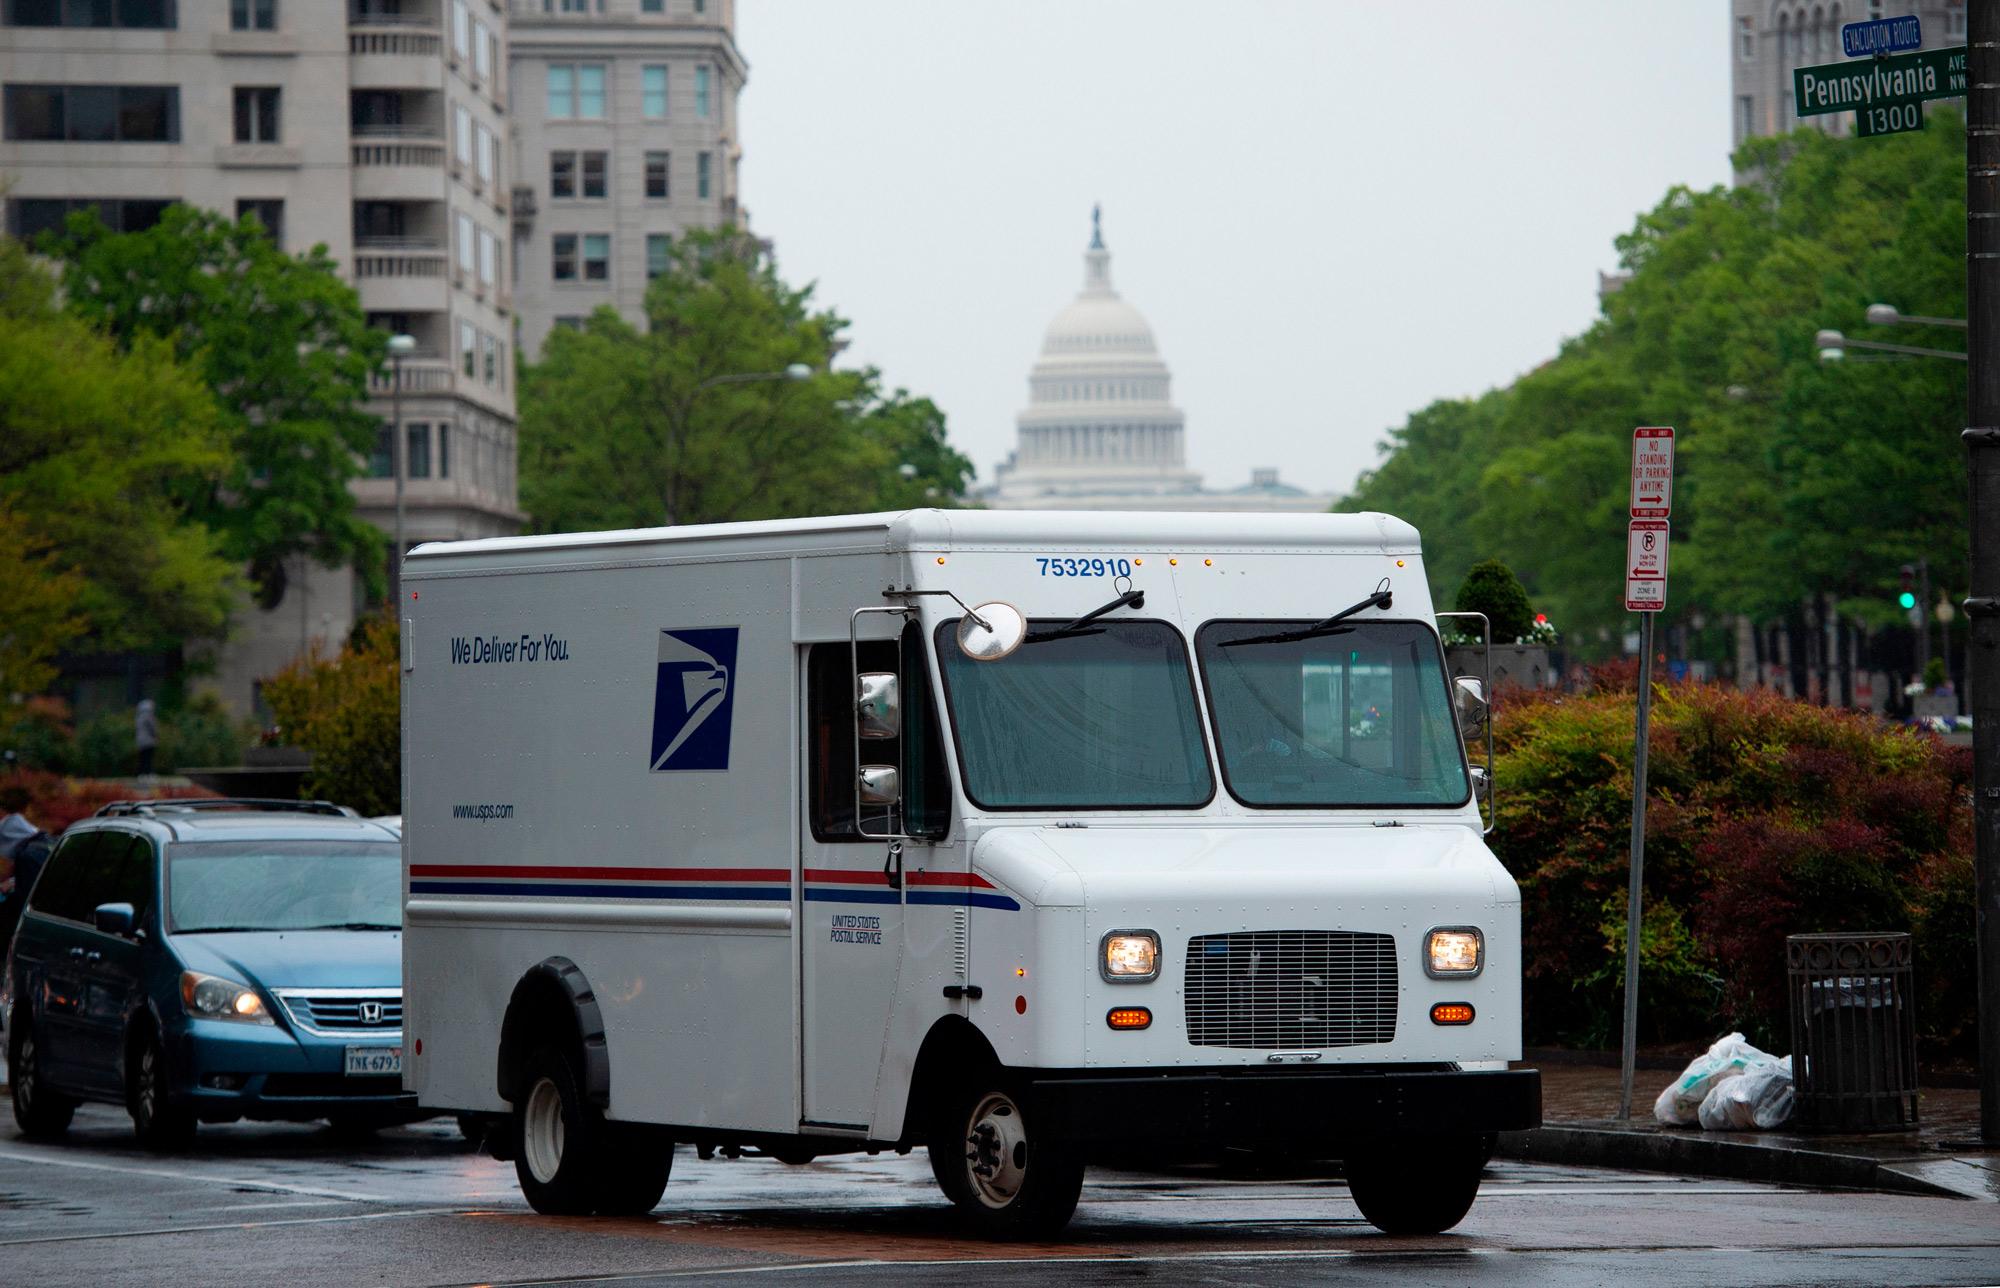 A US Postal Service truck drives down Pennsylvania Avenue in Washington, DC, on April 23.